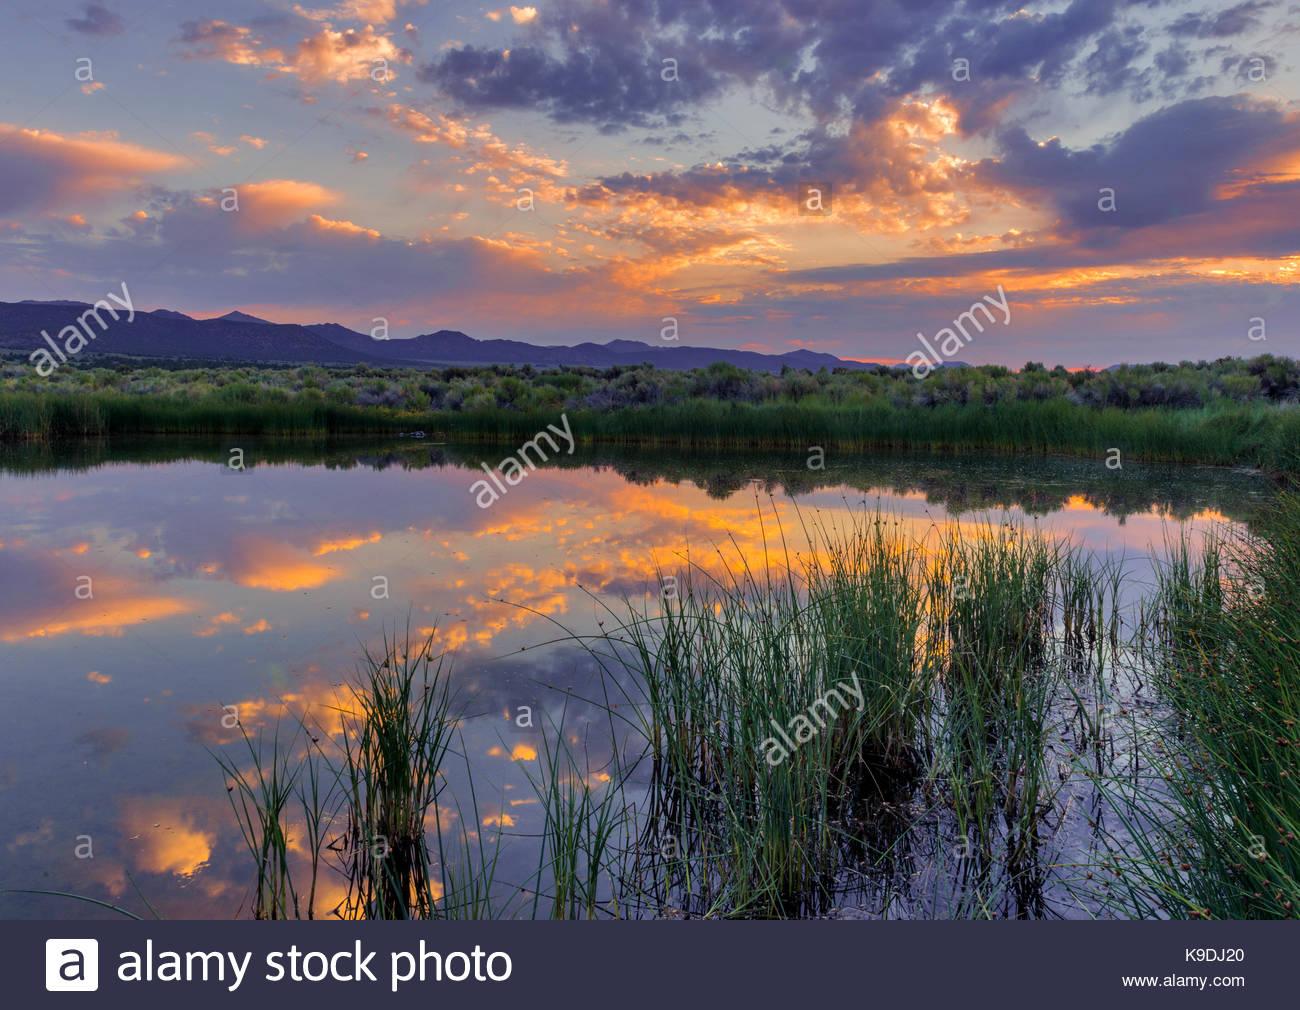 Dechambeau Ponds at Dawn, Mono Basin National Forest Scenic Area, California - Stock Image